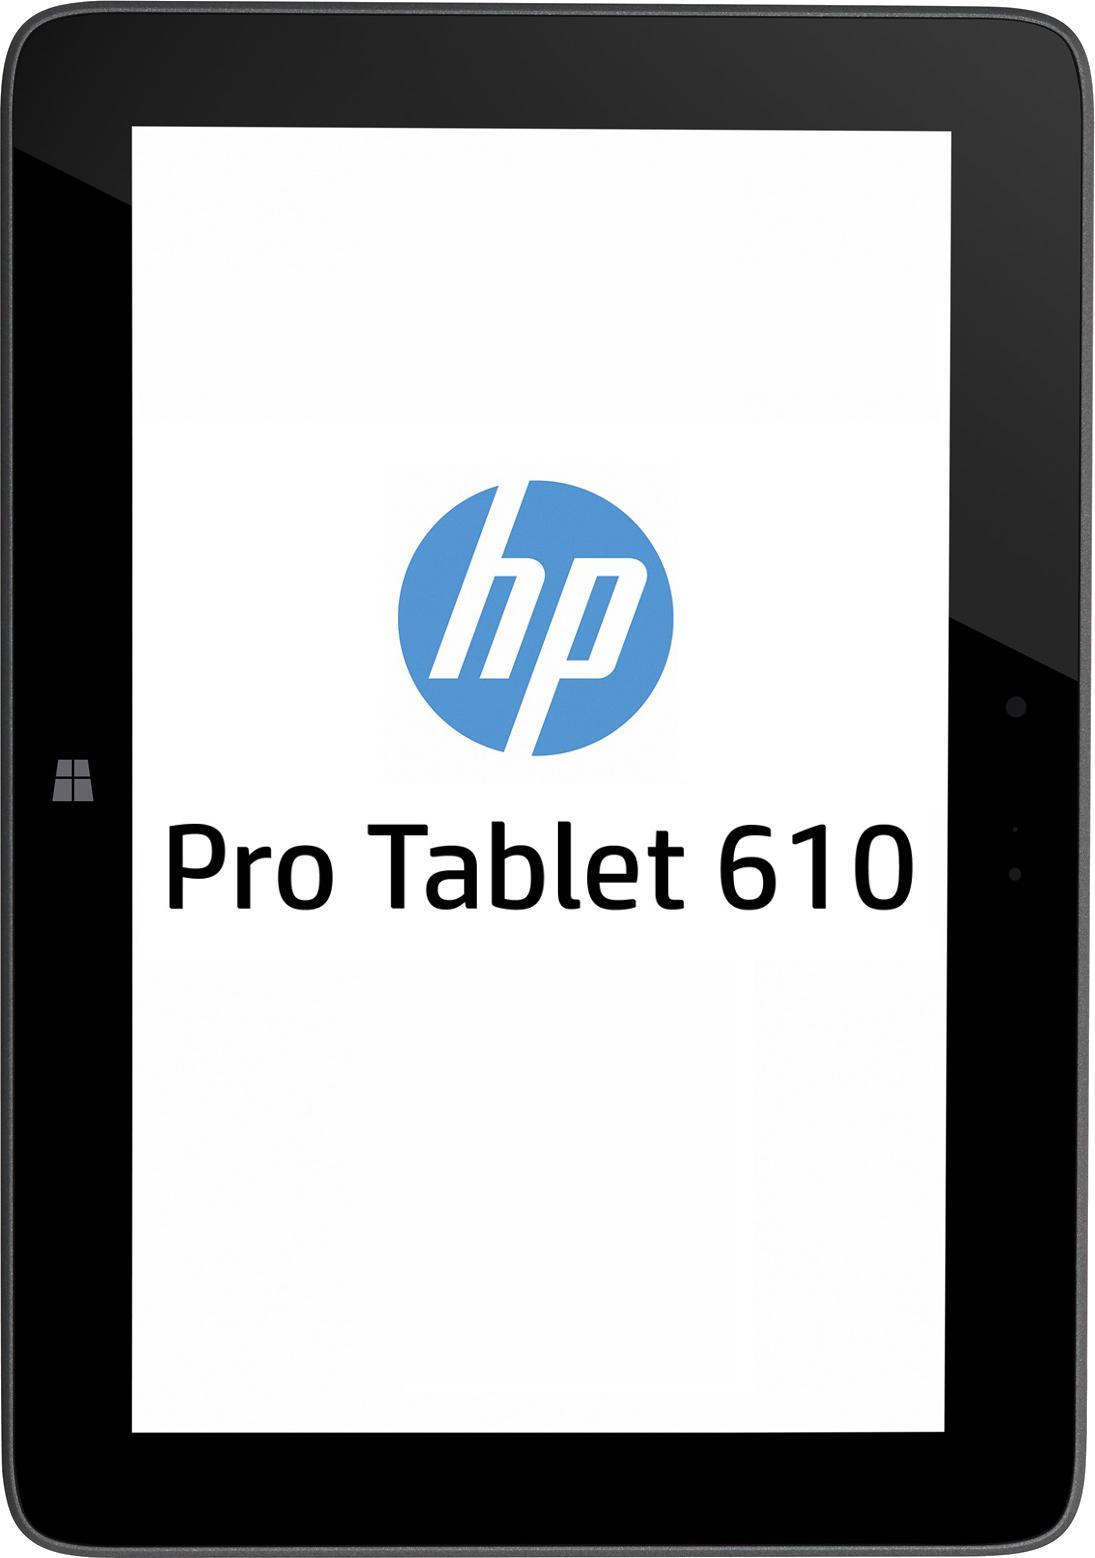 HP Pro Tablet 610 G1 PC (G4T48UT)